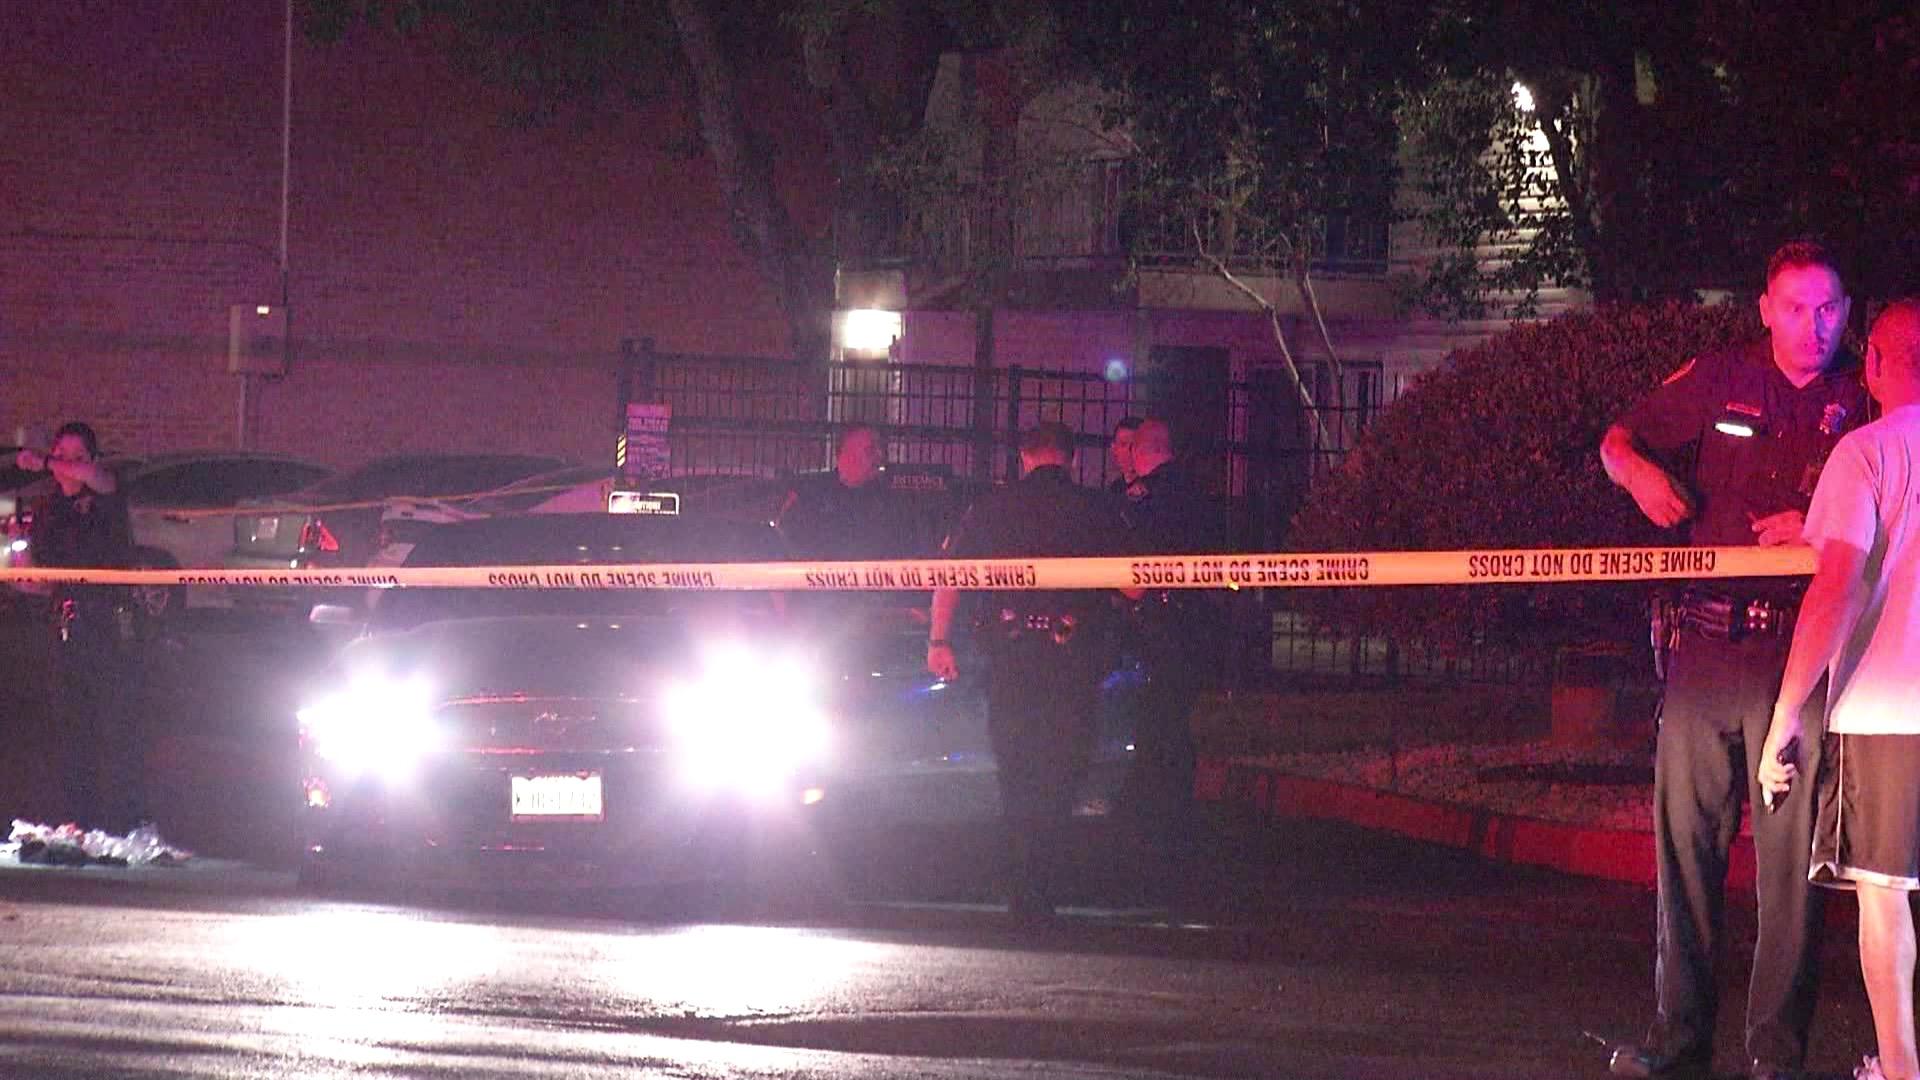 f8571ca42eb88 17-year-old killed in NE side triple shooting is ID'd - San Antonio  Express-News